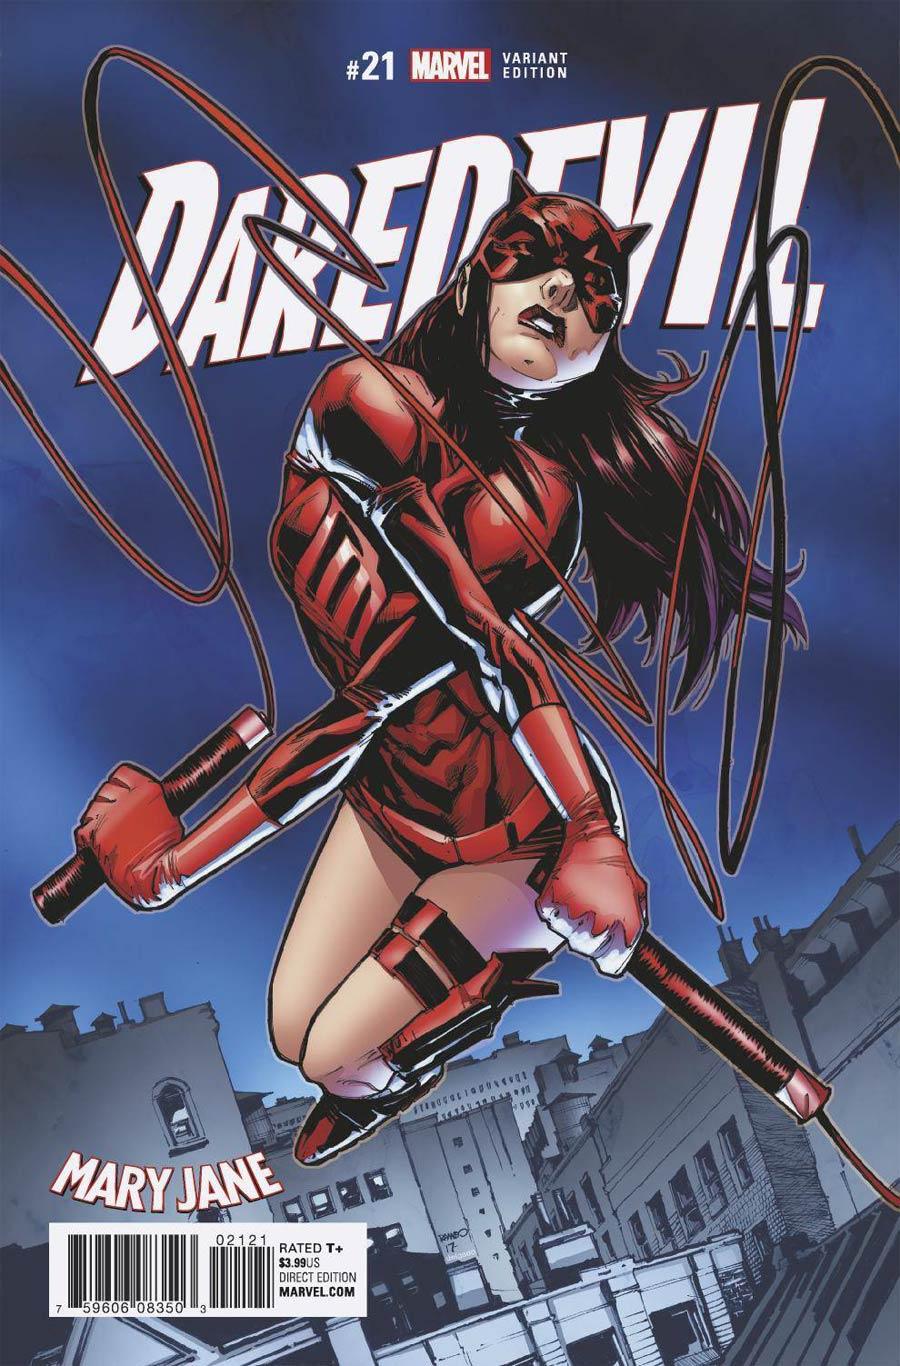 Daredevil Vol 5 #21 Cover B Variant Humberto Ramos Mary Jane Cover